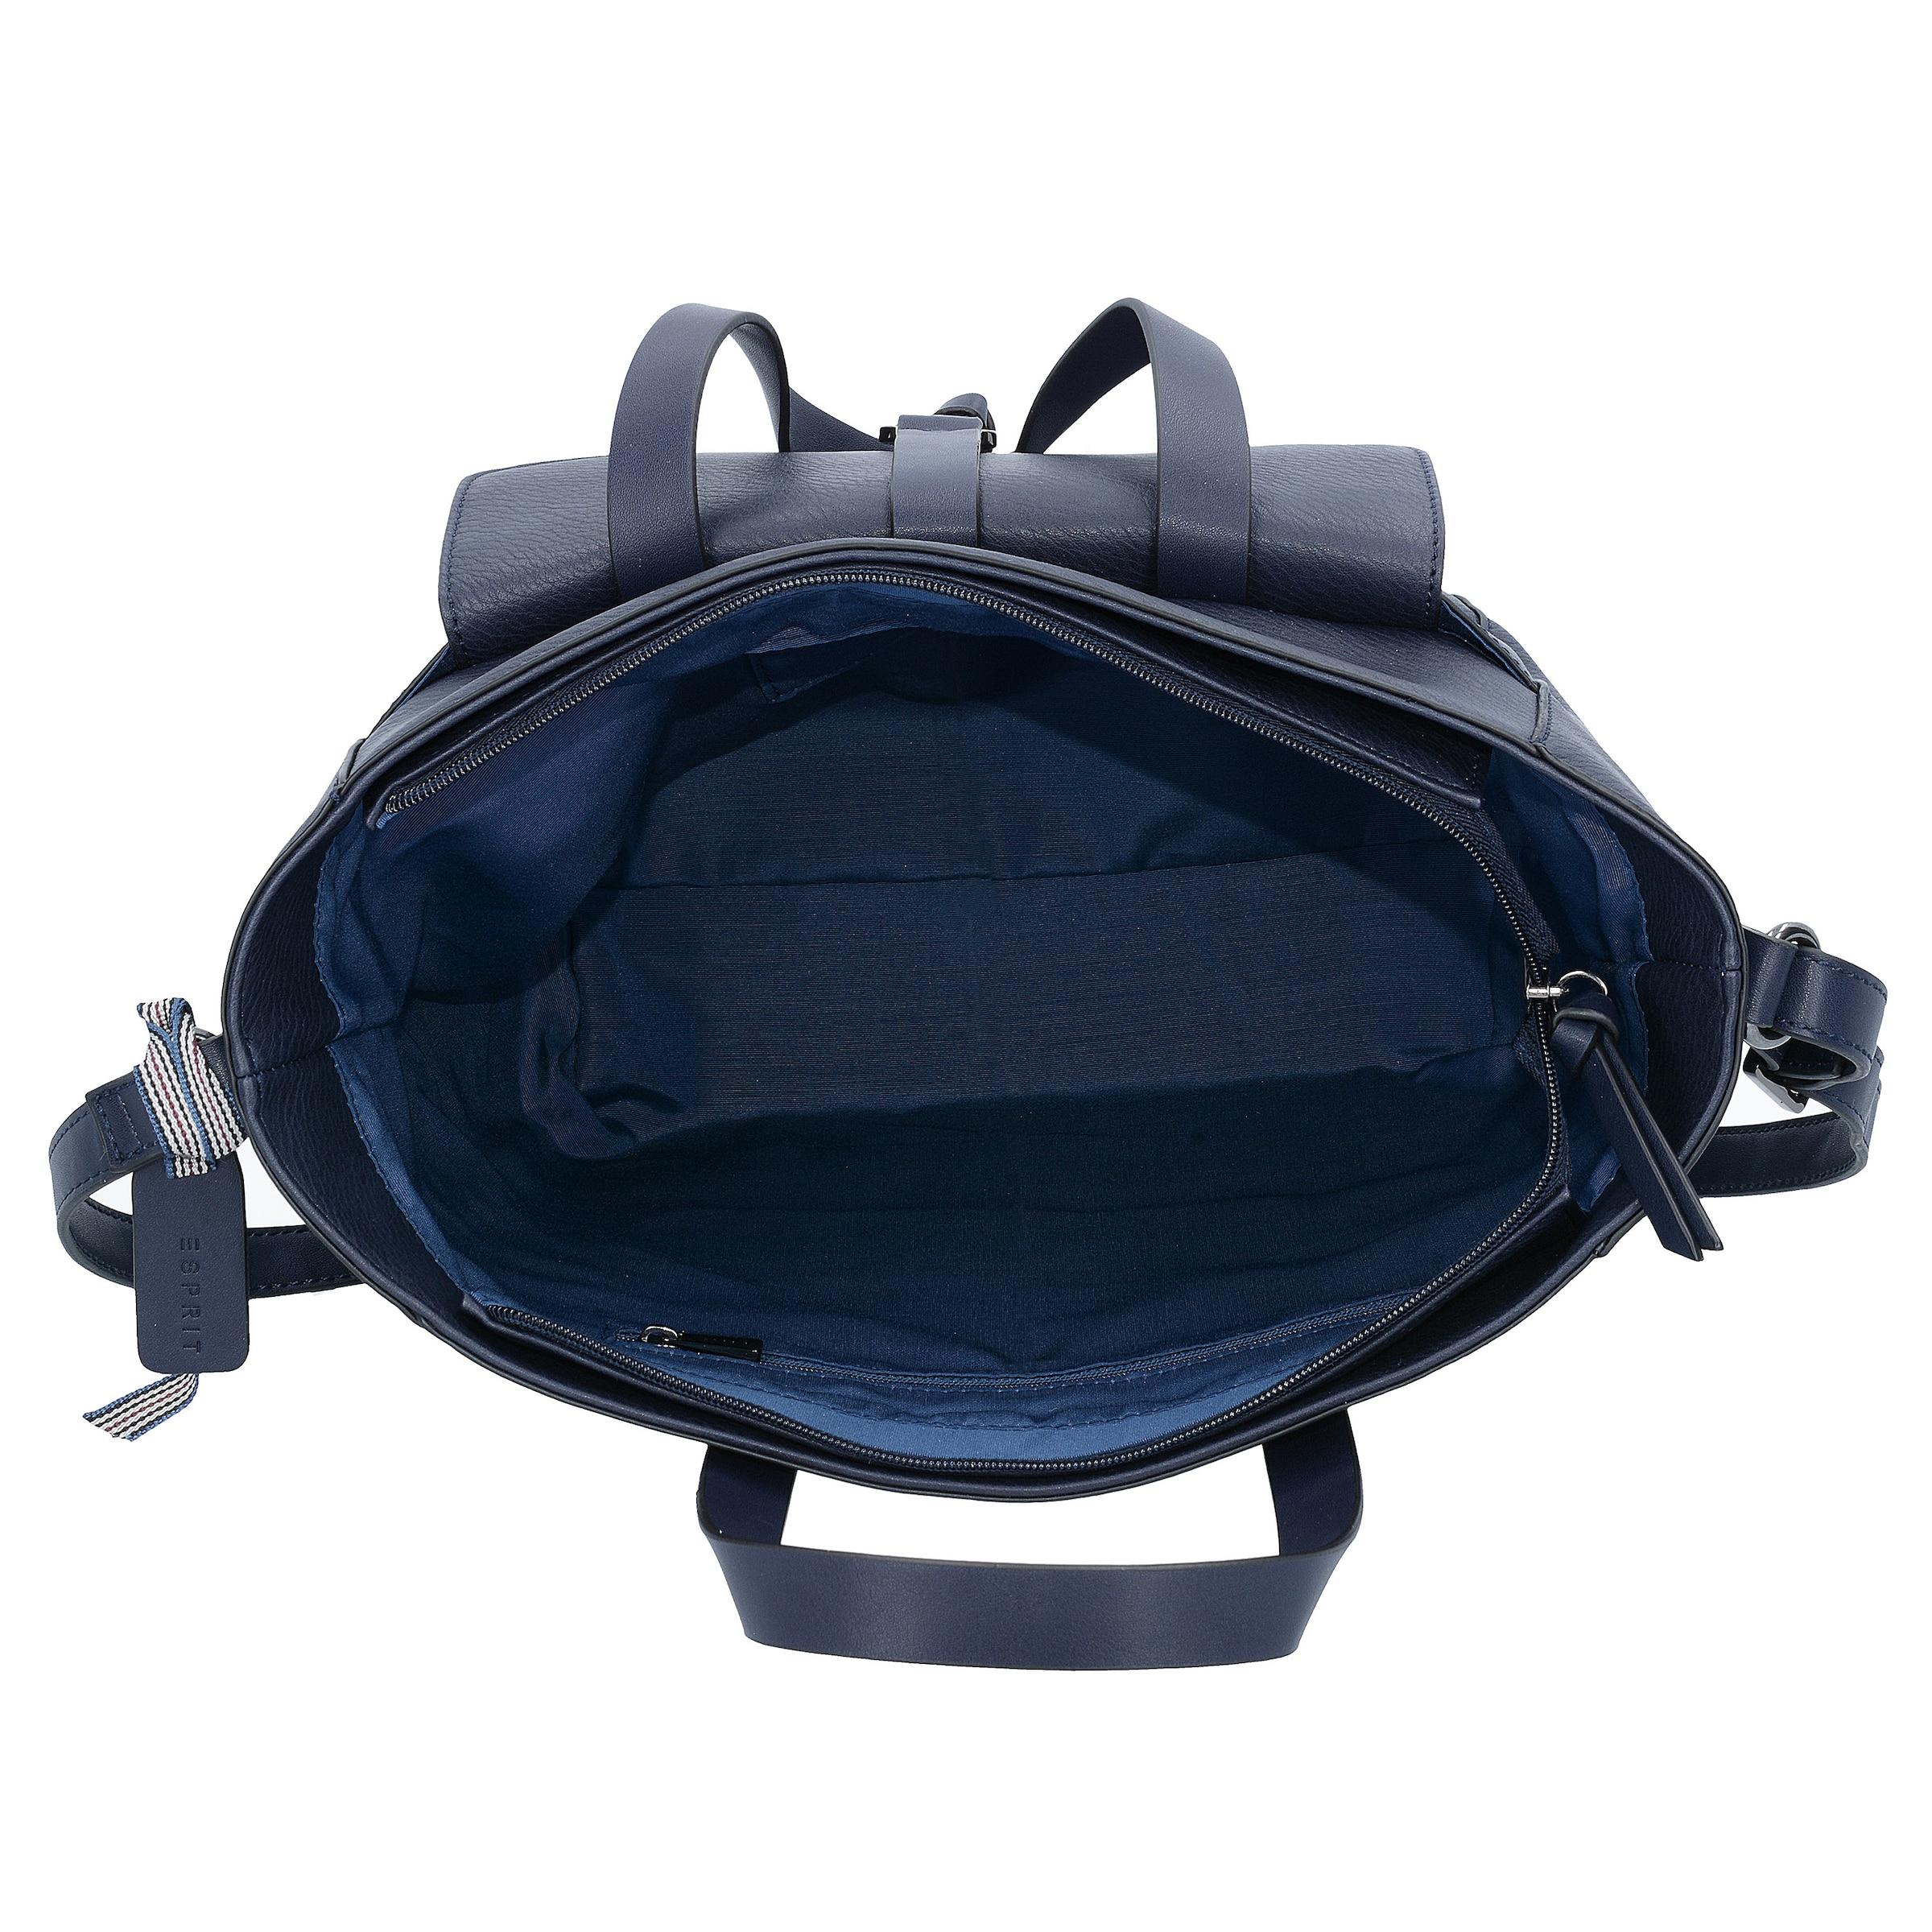 Handtasche ' 'kara Esprit In Navy Aq4jL5c3RS